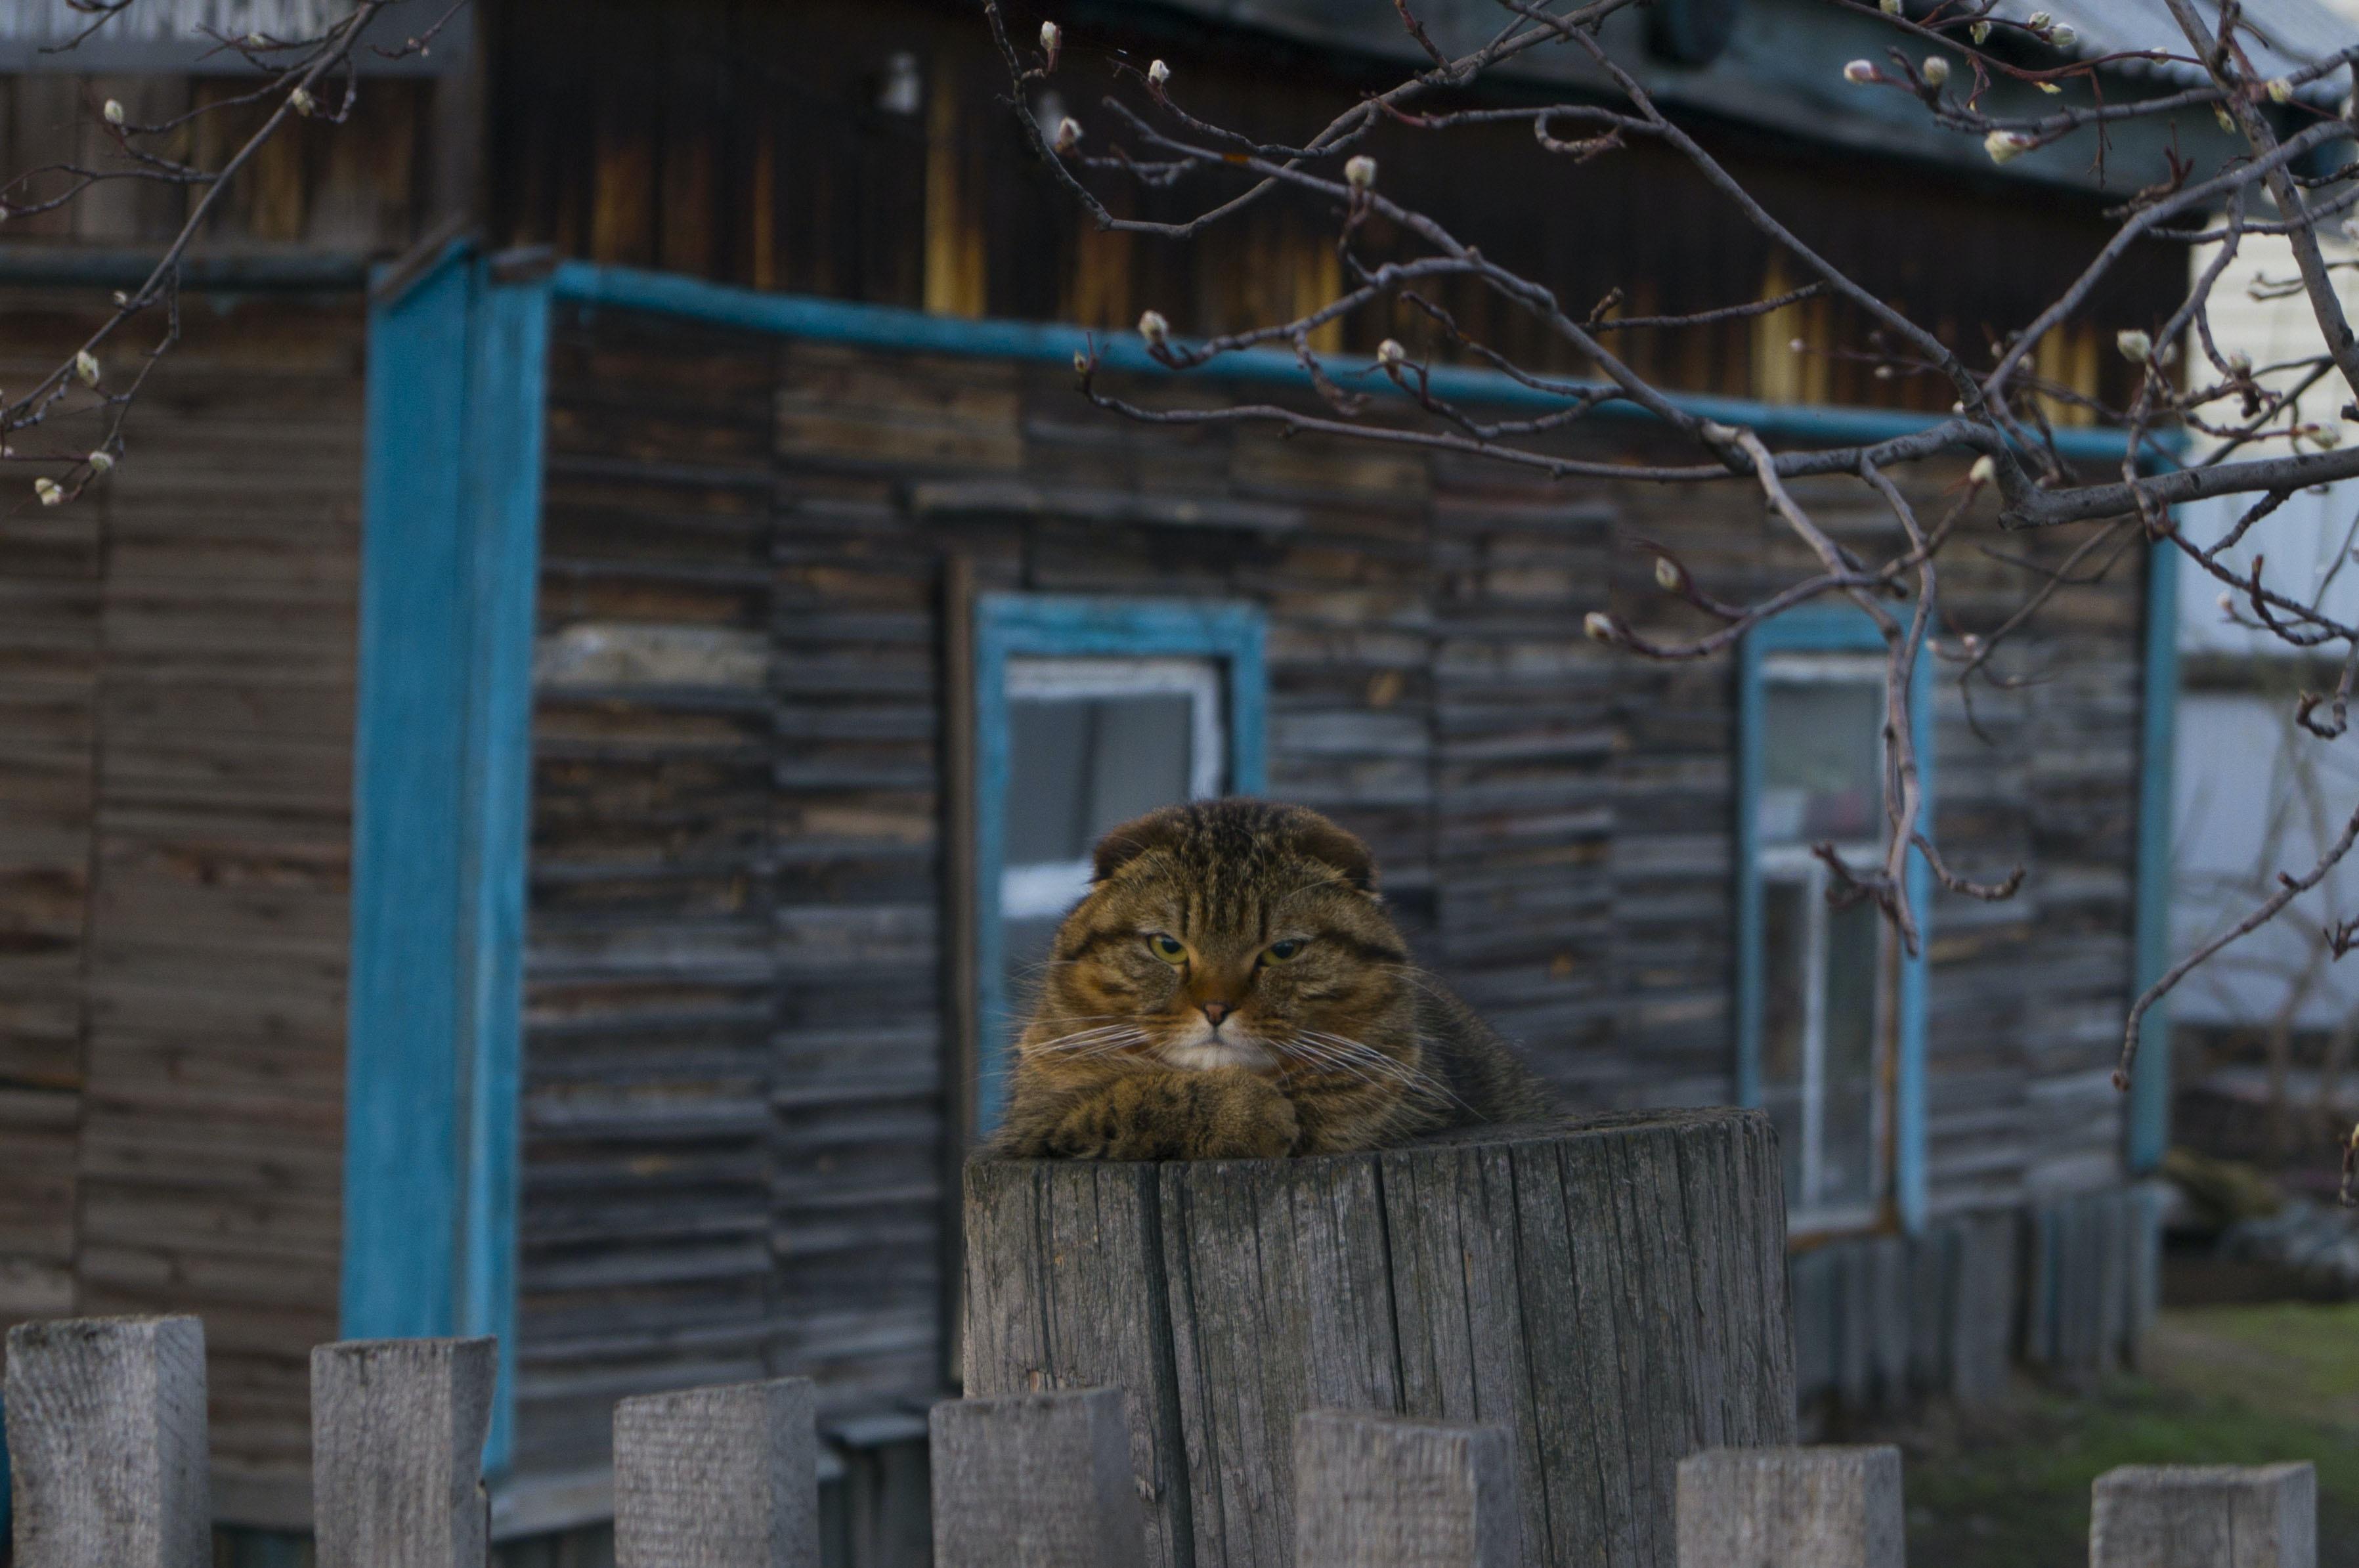 beige tabby cat on top of gray wooden post